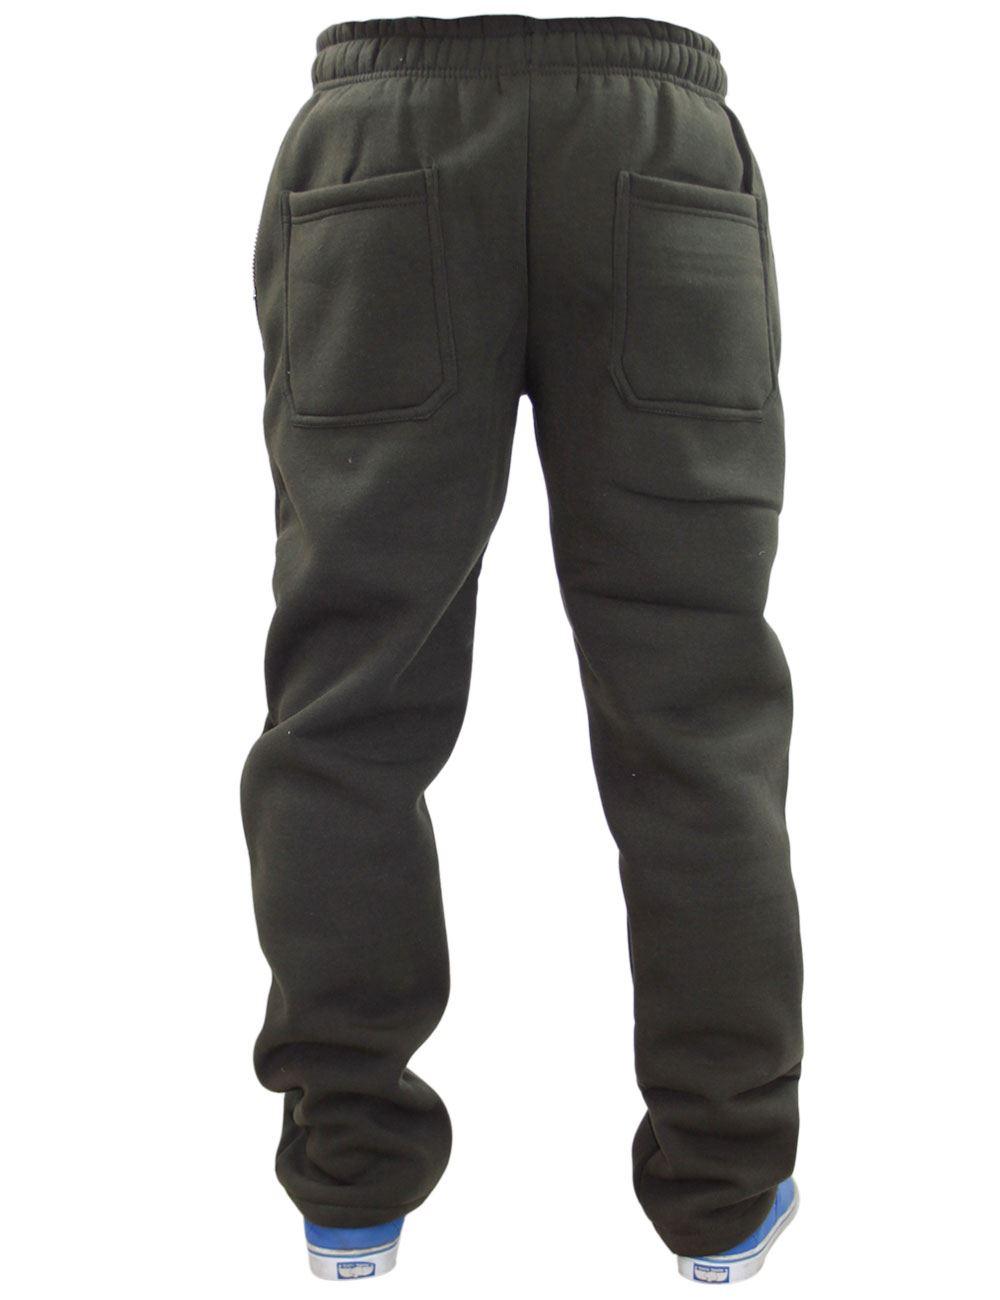 Mens-Women-Plain-Fleece-Joggers-Bottoms-Jogging-Pant-Gym-Fitness-Sports-Trousers thumbnail 9